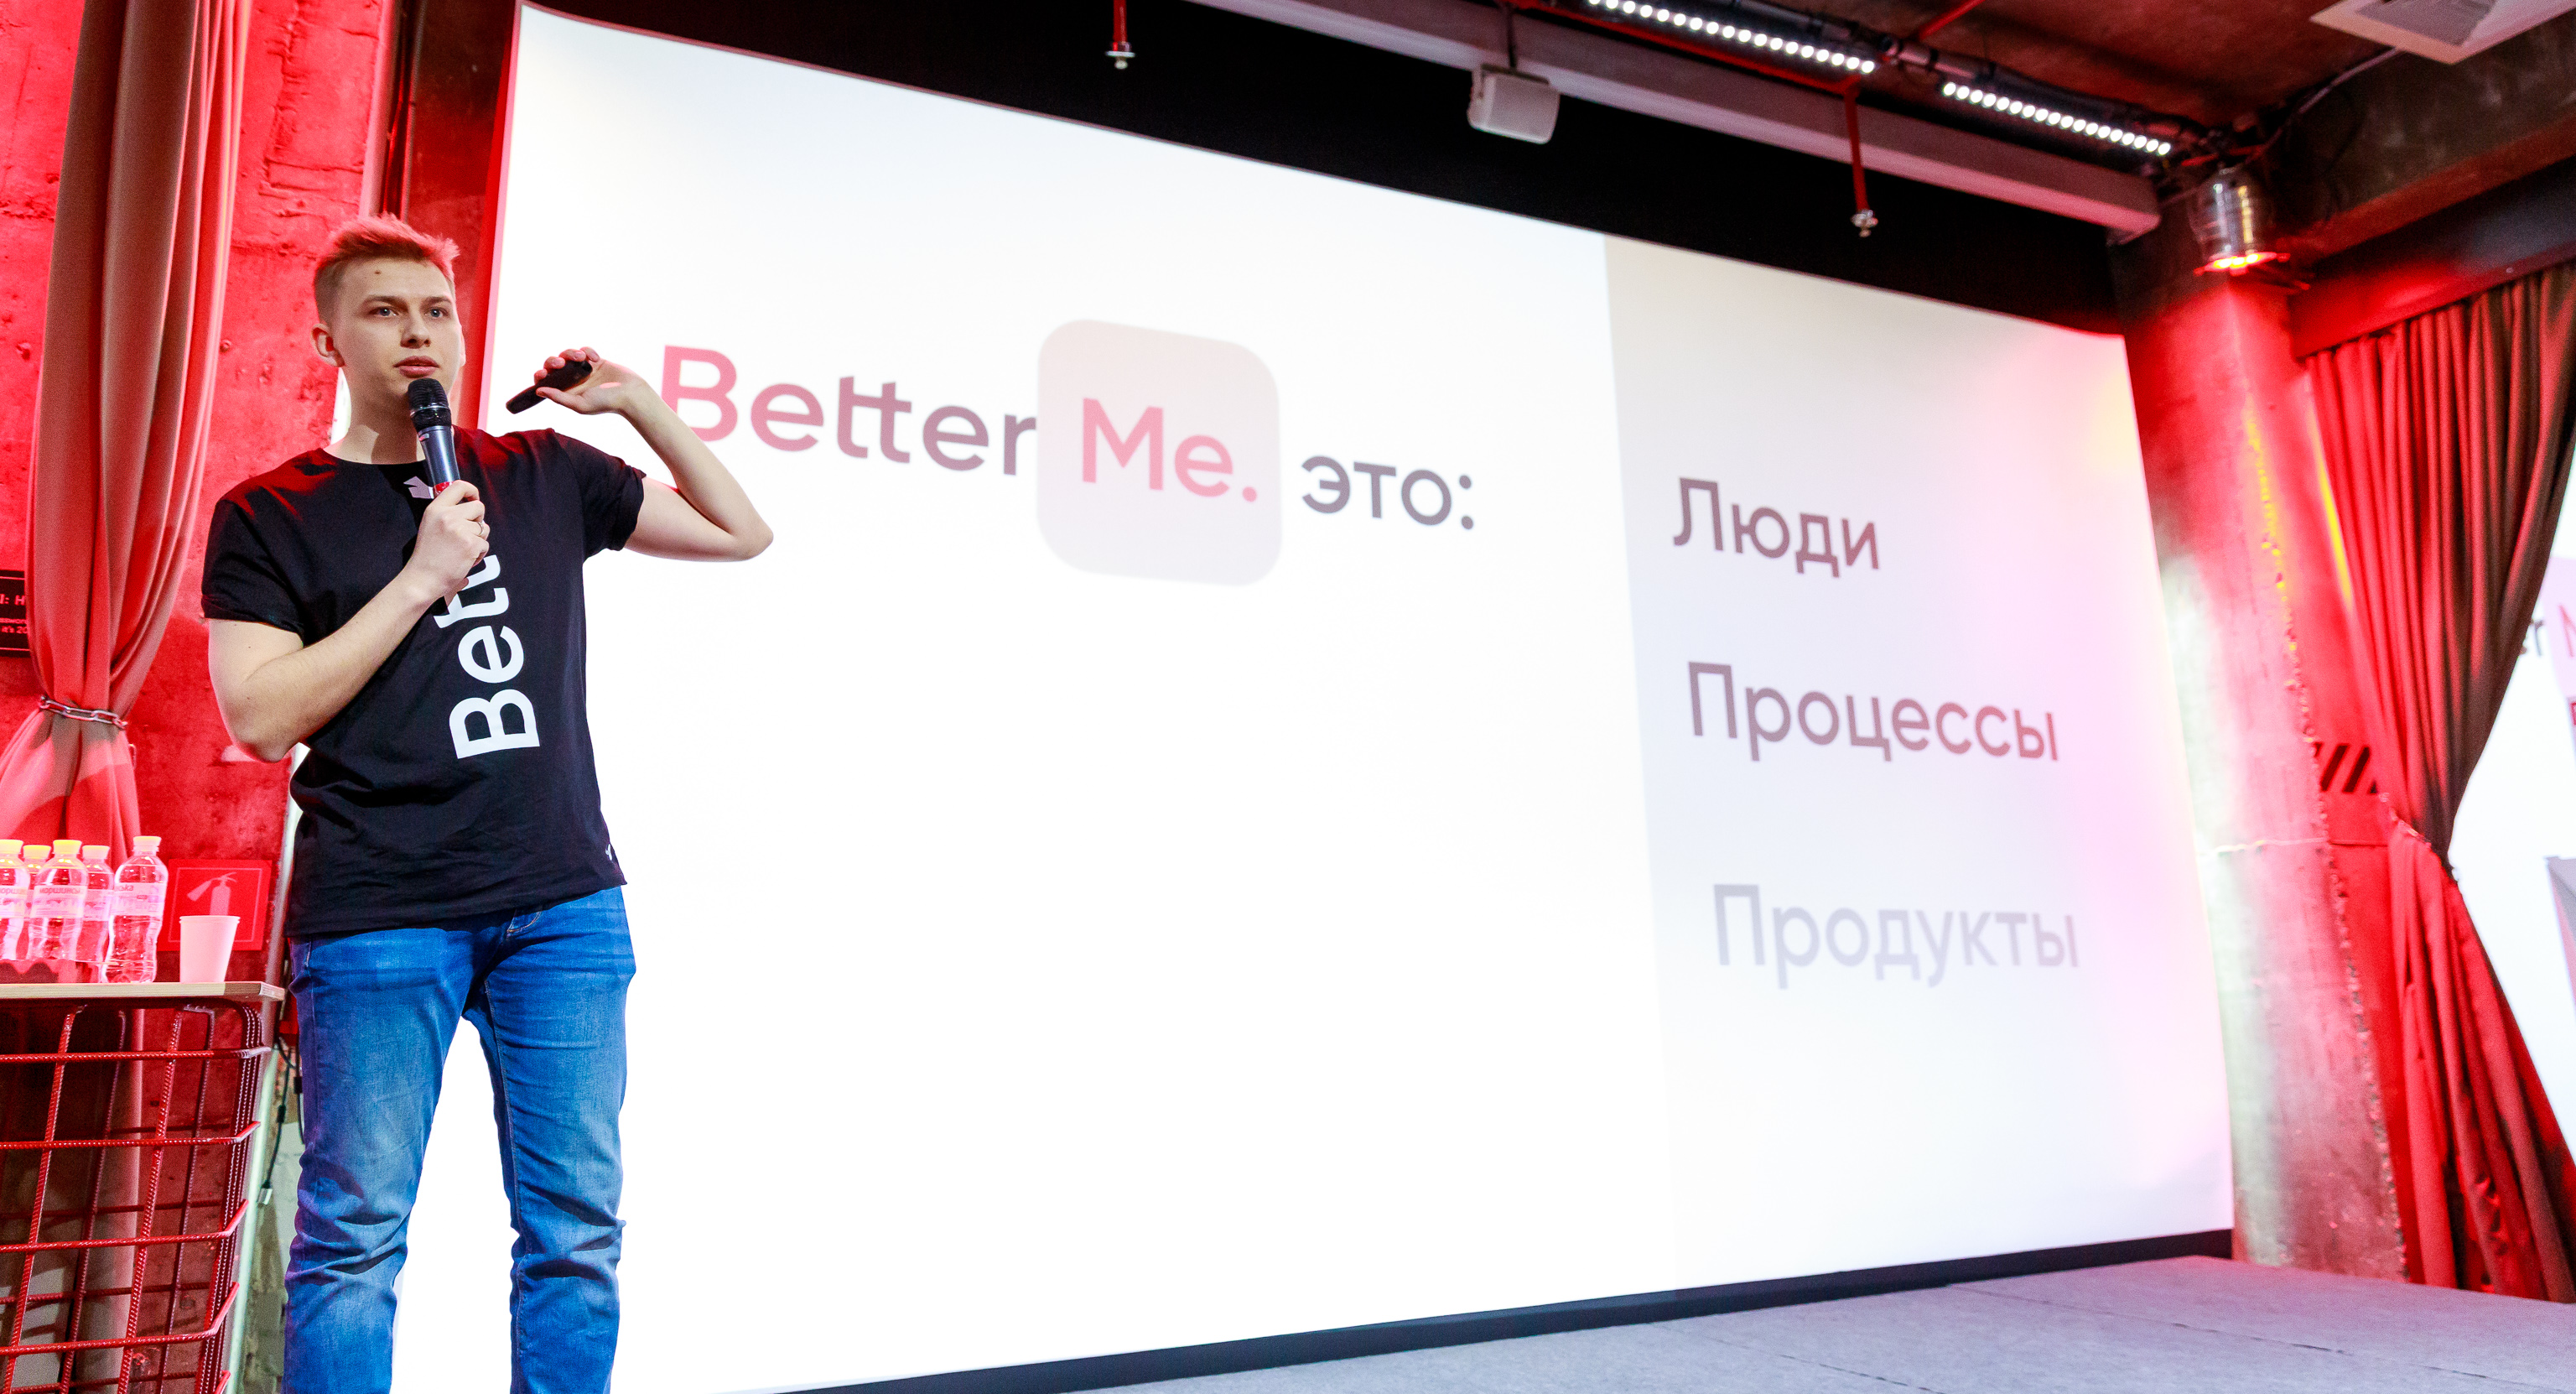 Николай Дыченко, BetterMe